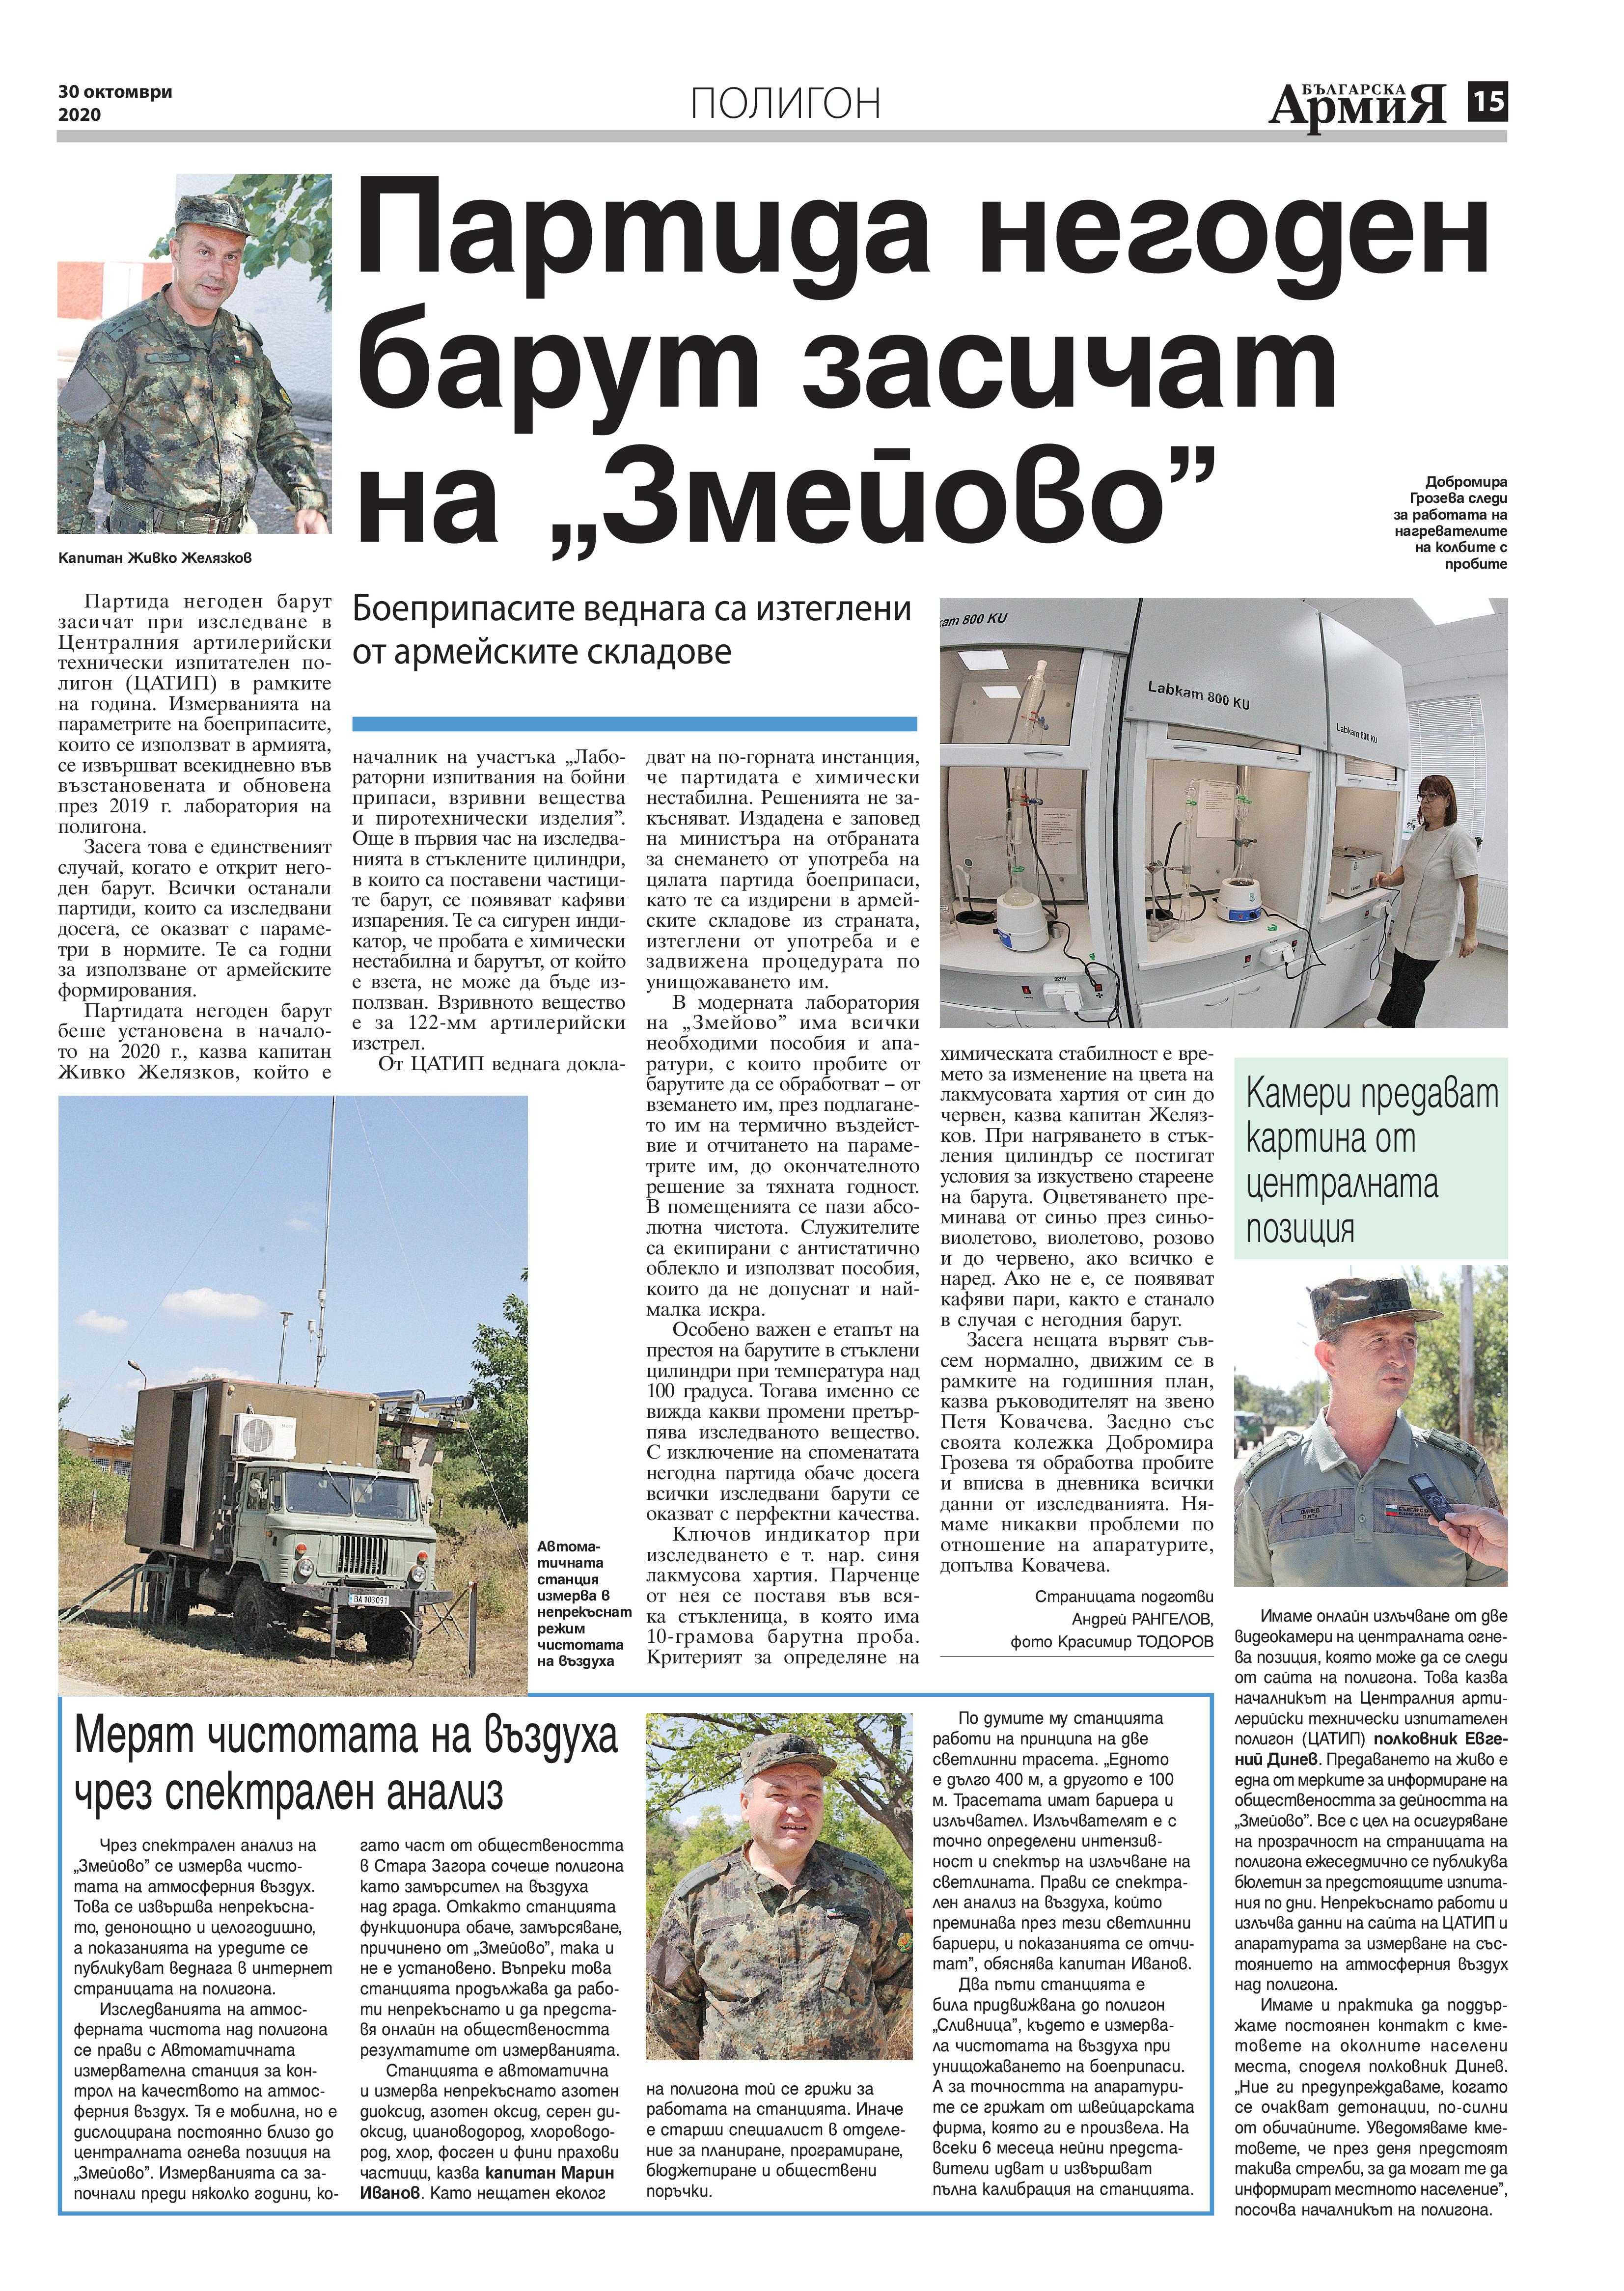 https://www.armymedia.bg/wp-content/uploads/2015/06/15-46.jpg